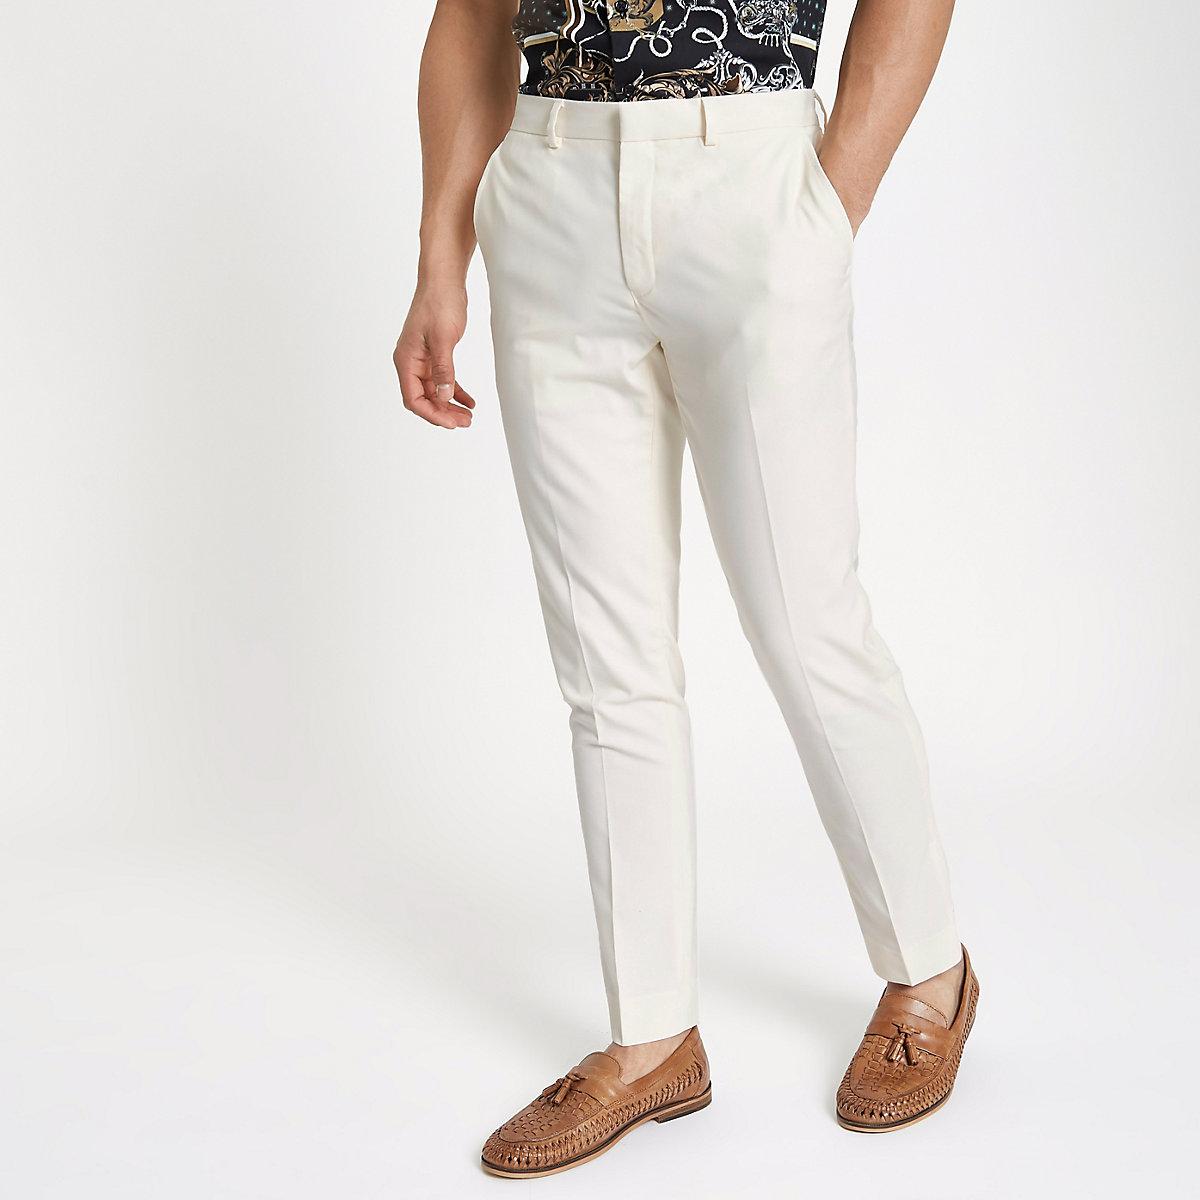 Cream stretch skinny fit smart trousers